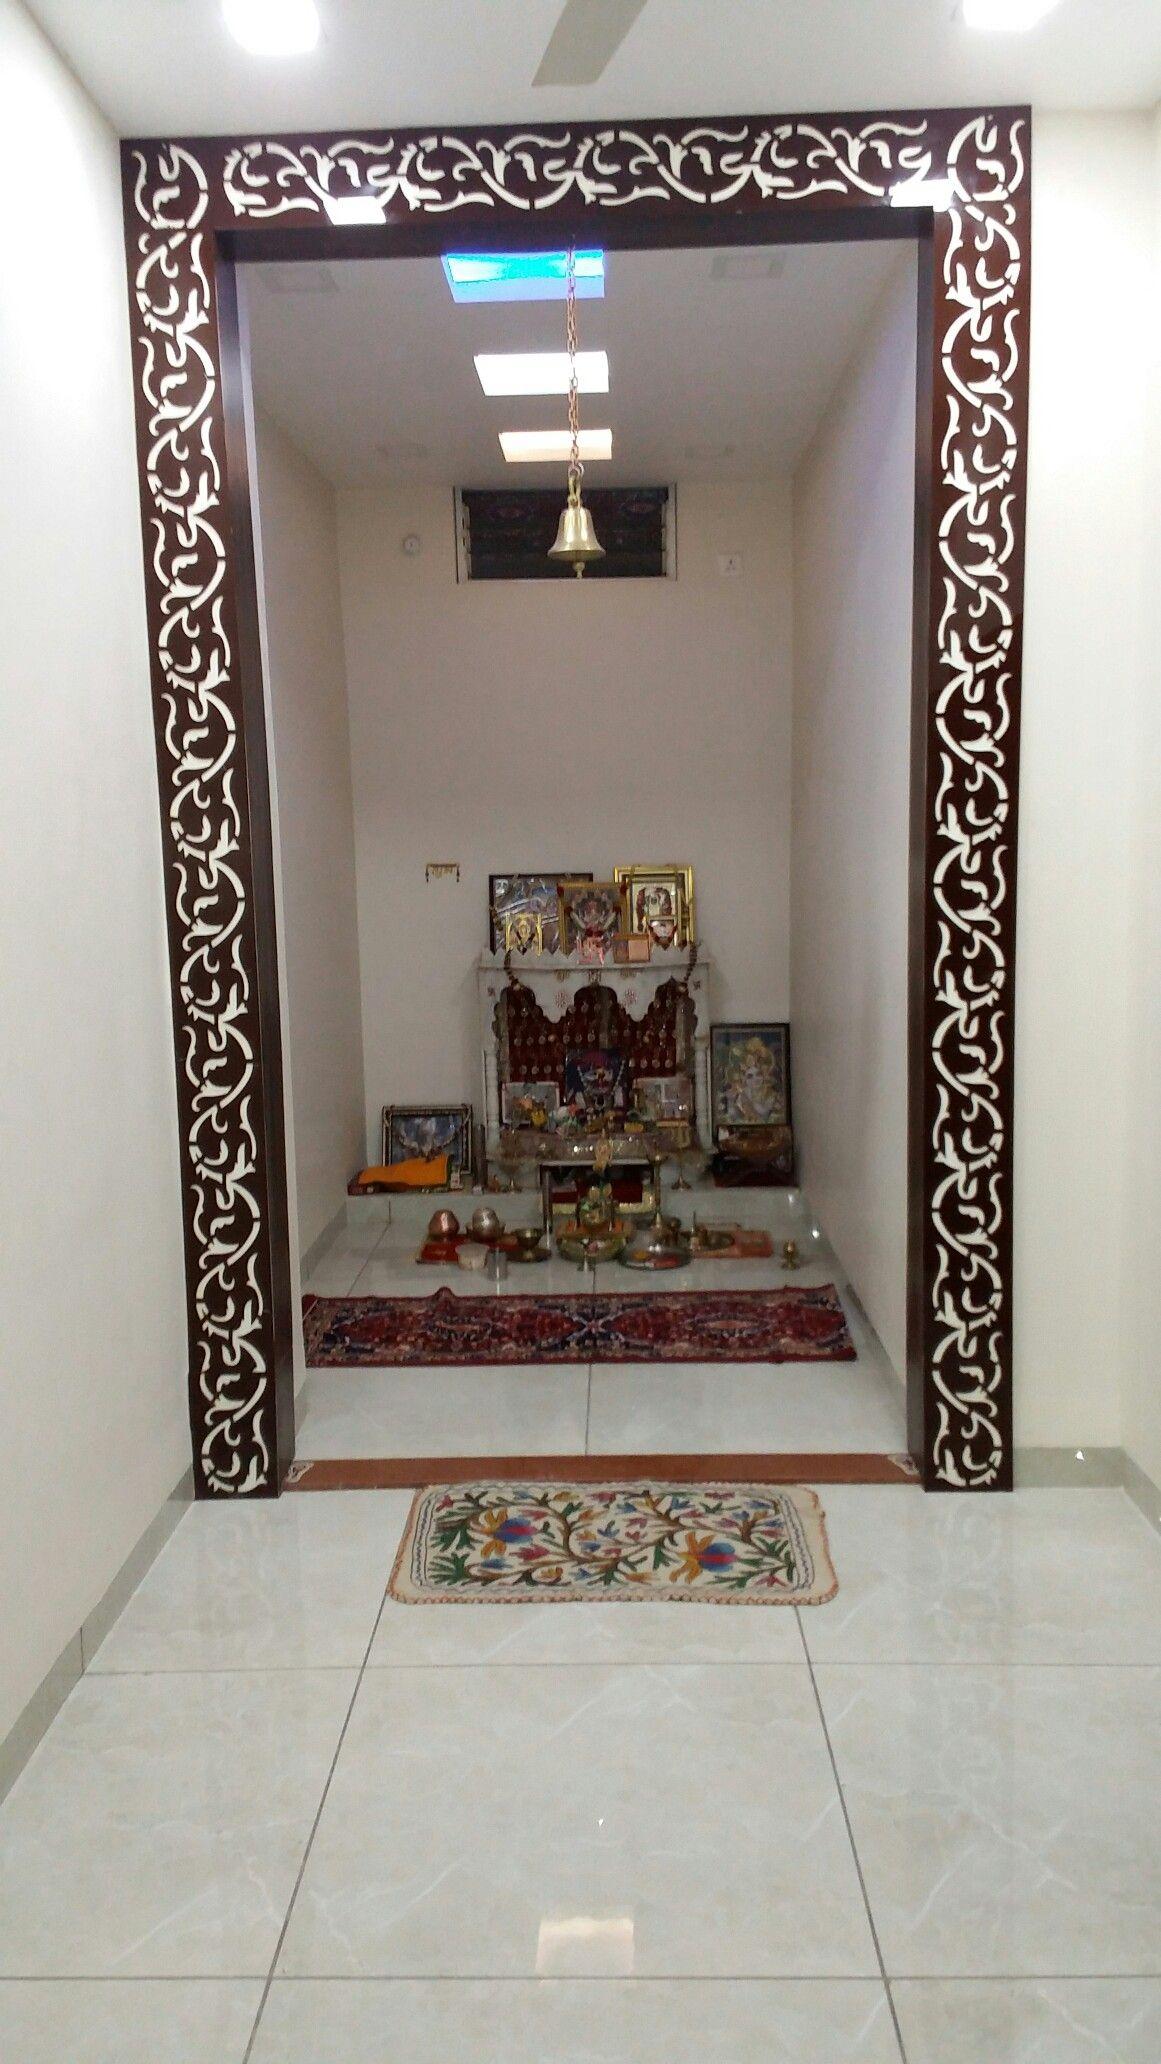 Padma priya padmapriya on pinterest